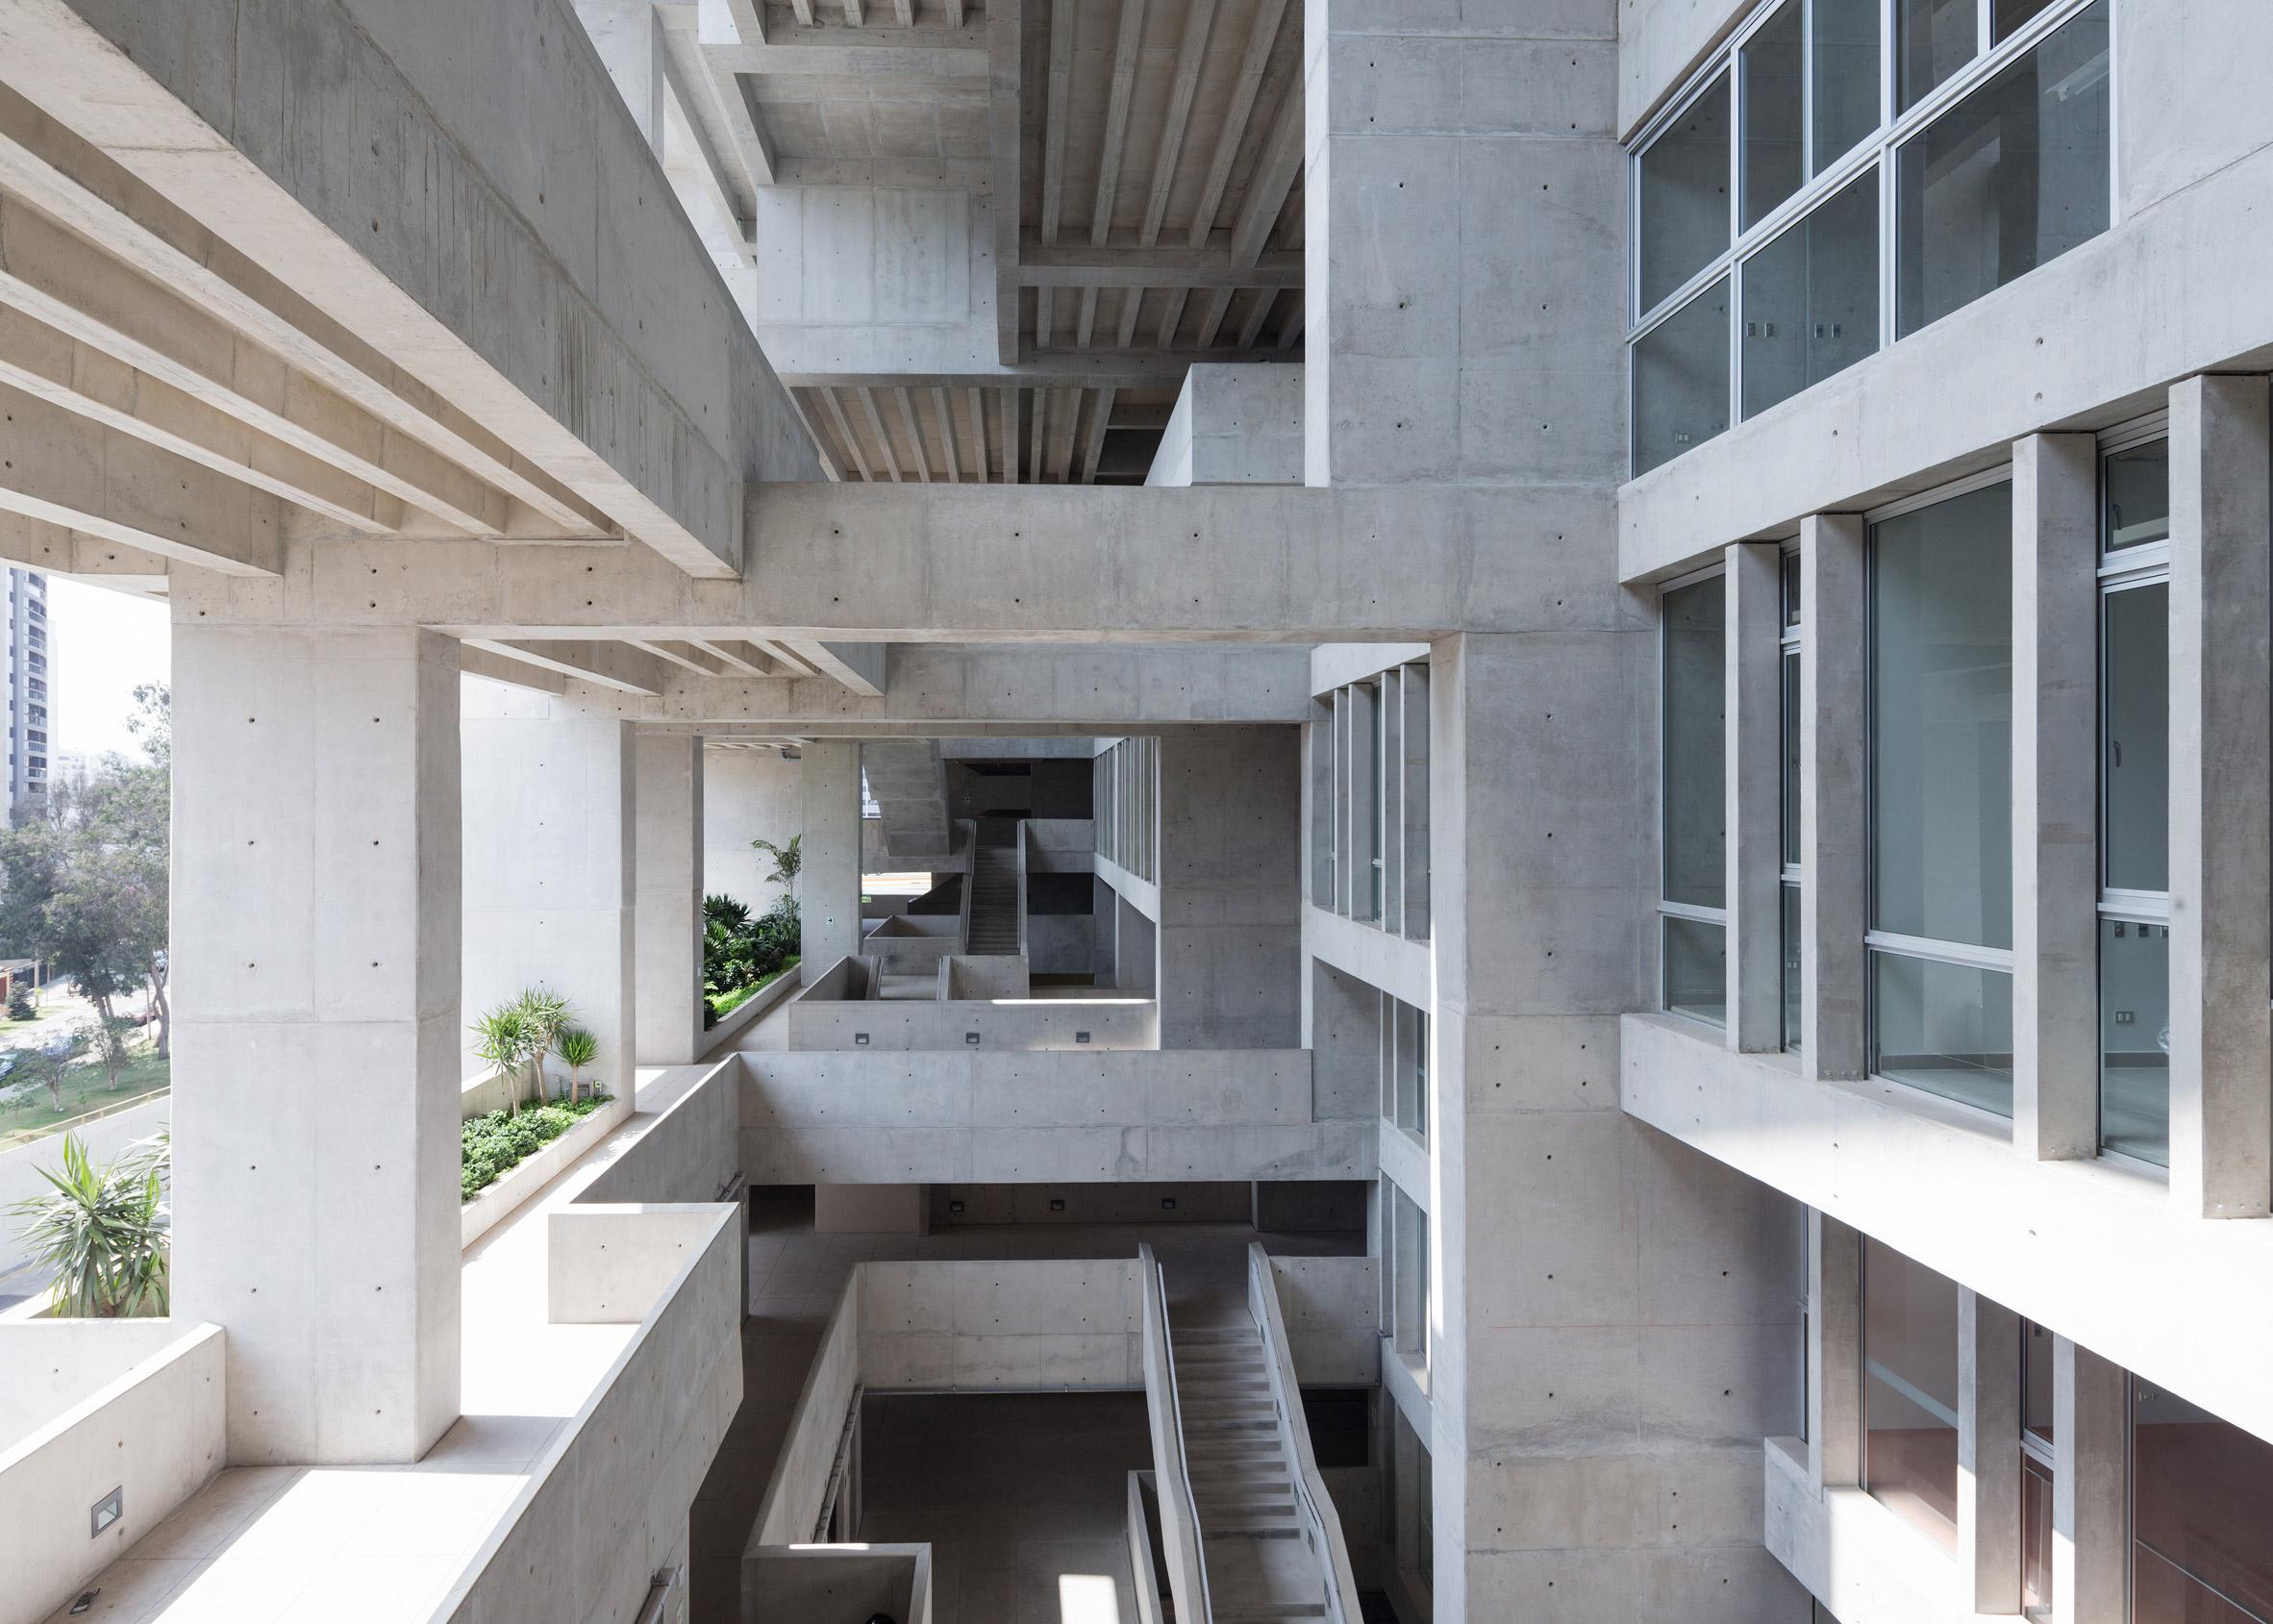 UTEC Universidad de Ingenieria y Tecnologia by Grafton Architects and Shell Arquitectos. Photograph by Iwan Baan